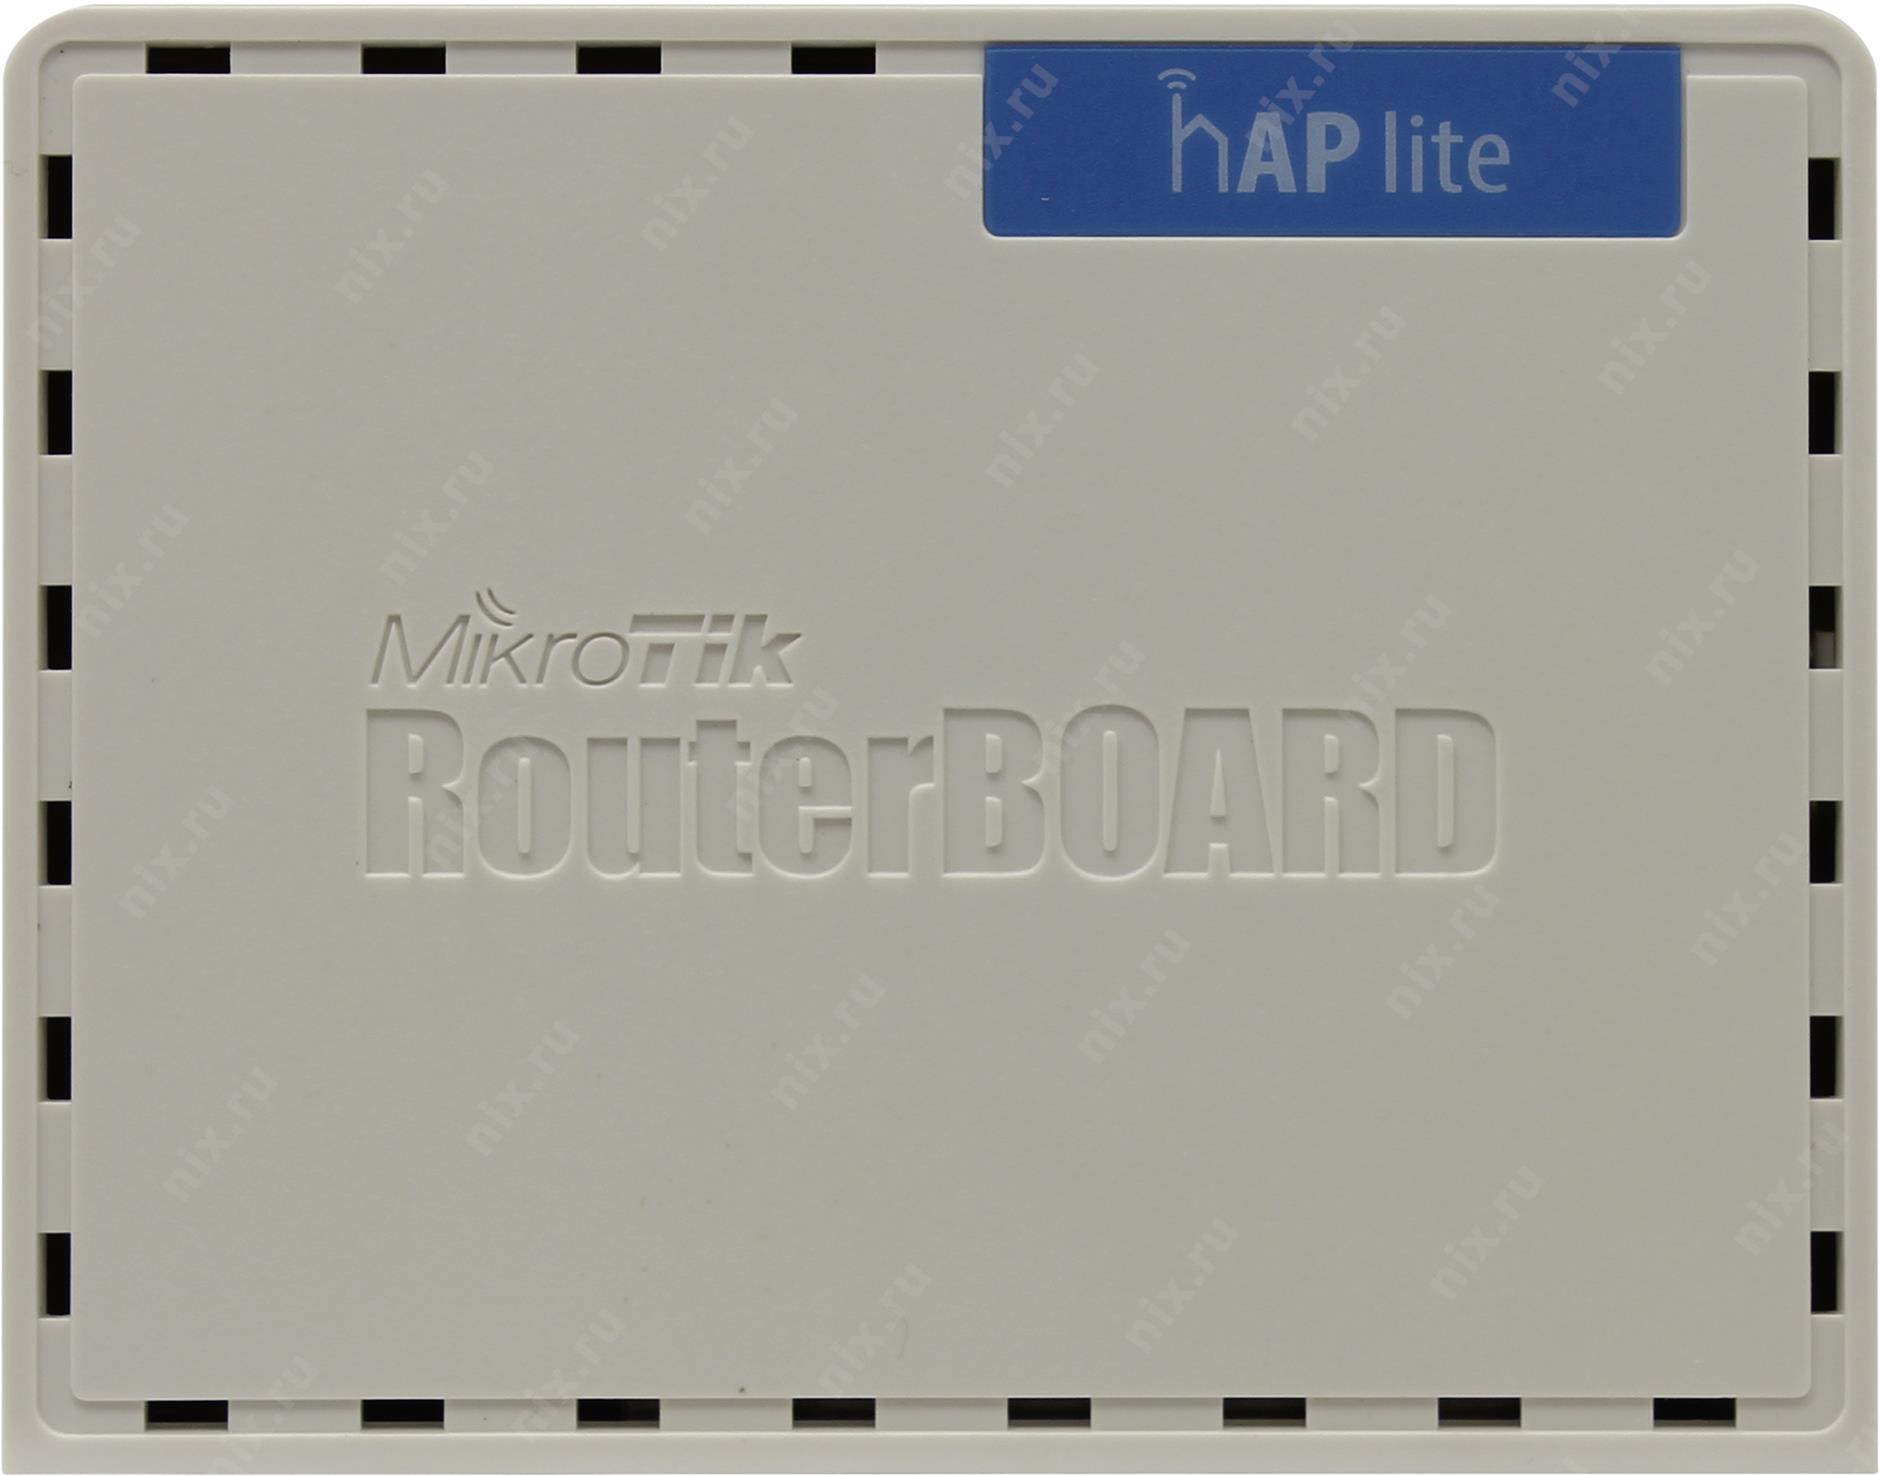 Mikrotik Routerboard Hap Lite Rb 941 2nd